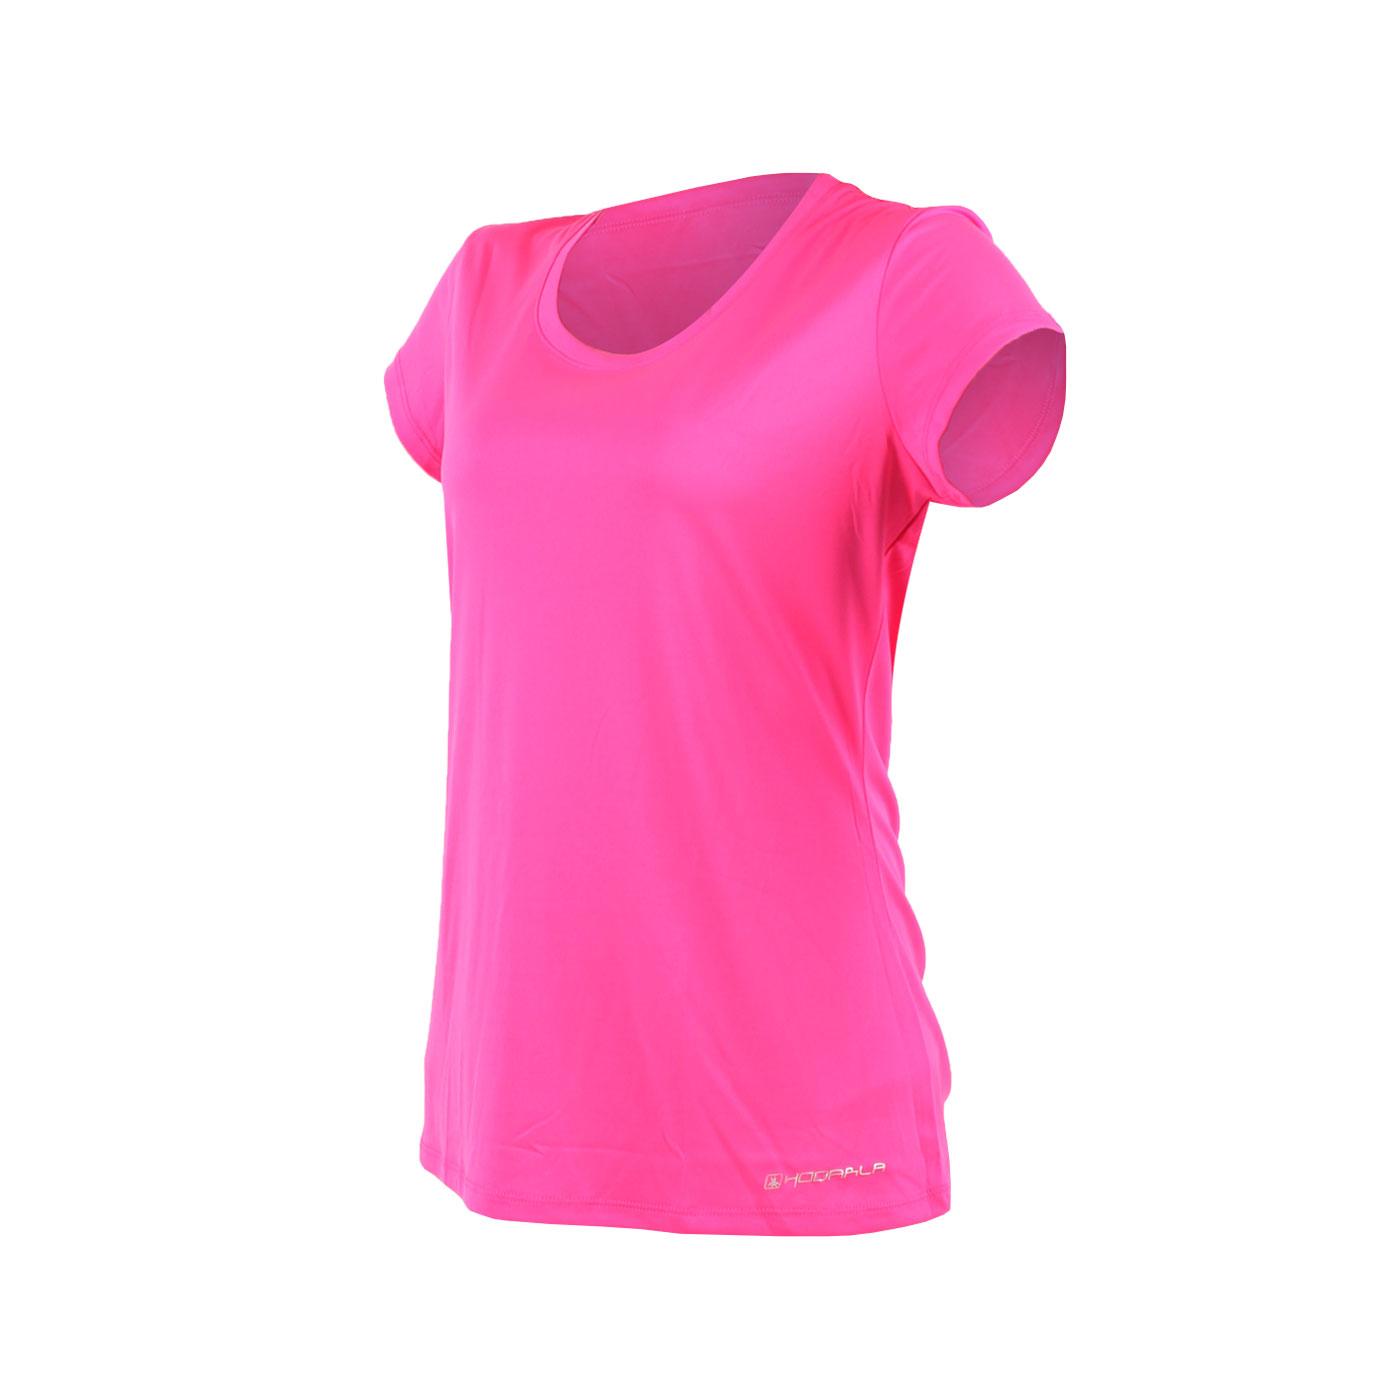 HODARLA 女款晶漾拼接短袖T恤 3125202 - 透明粉紅